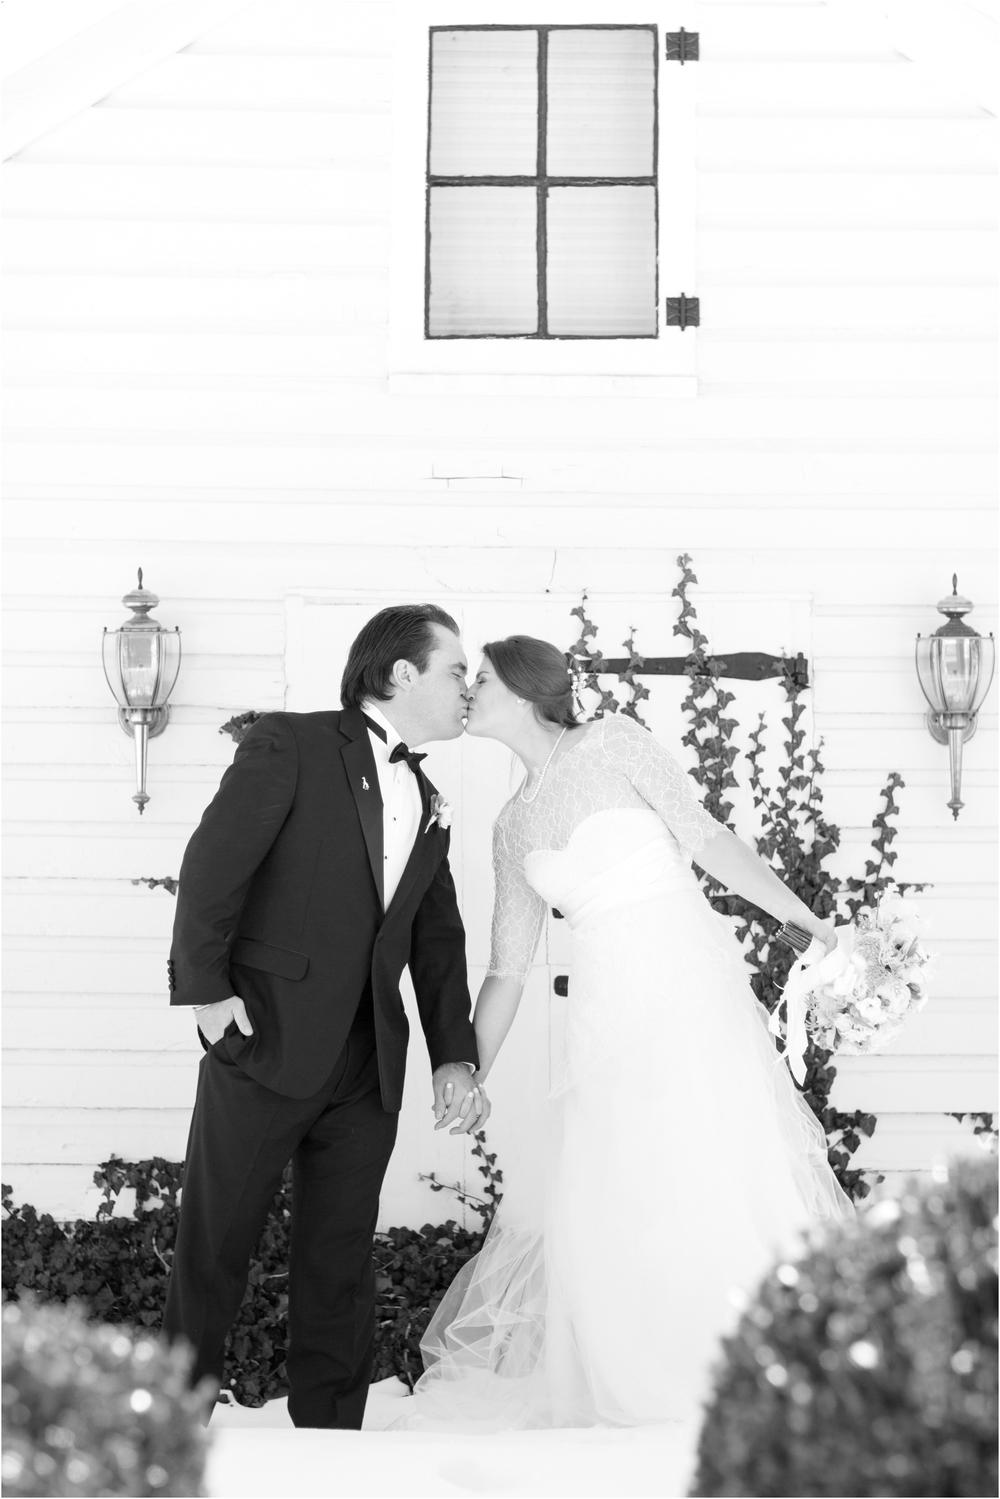 2-Dunn-Wedding-Bride-Groom-Portraits-942.jpg